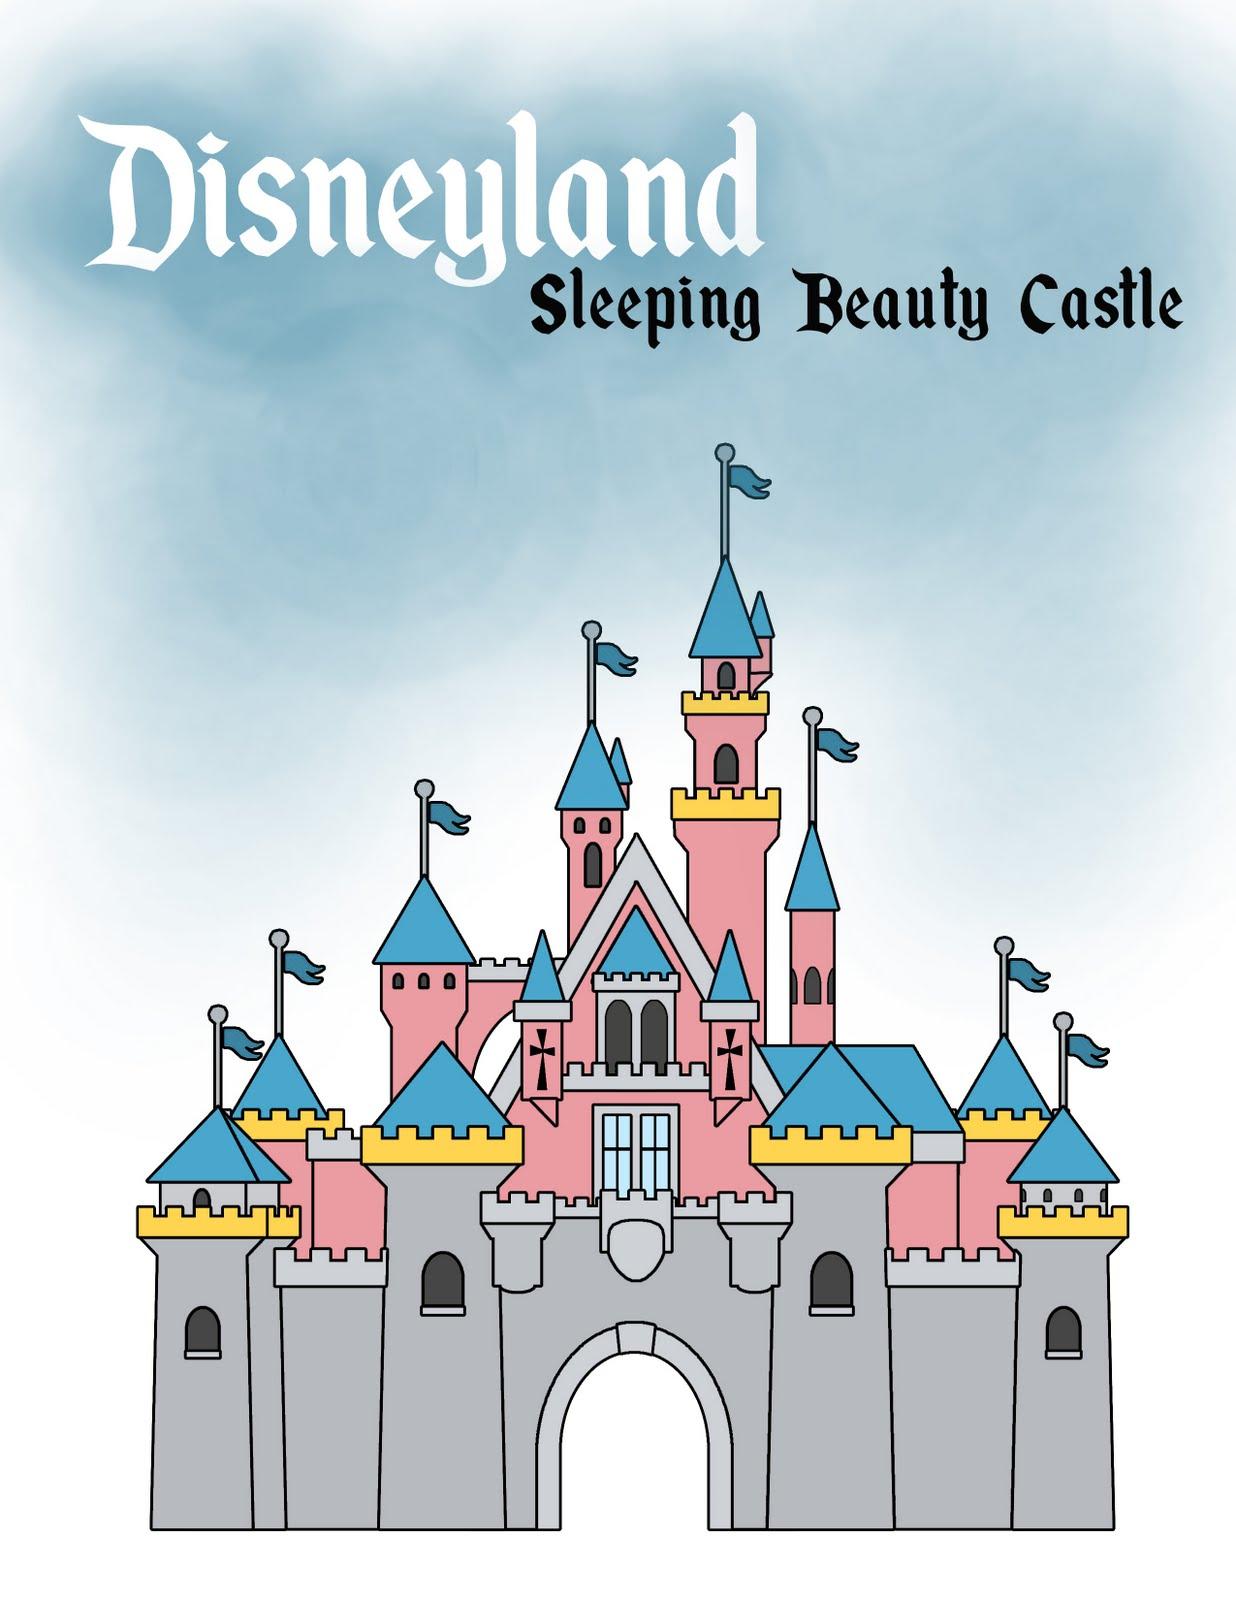 Palace clipart sleeping beauty castle SVG Disney disneyland Disney Disney